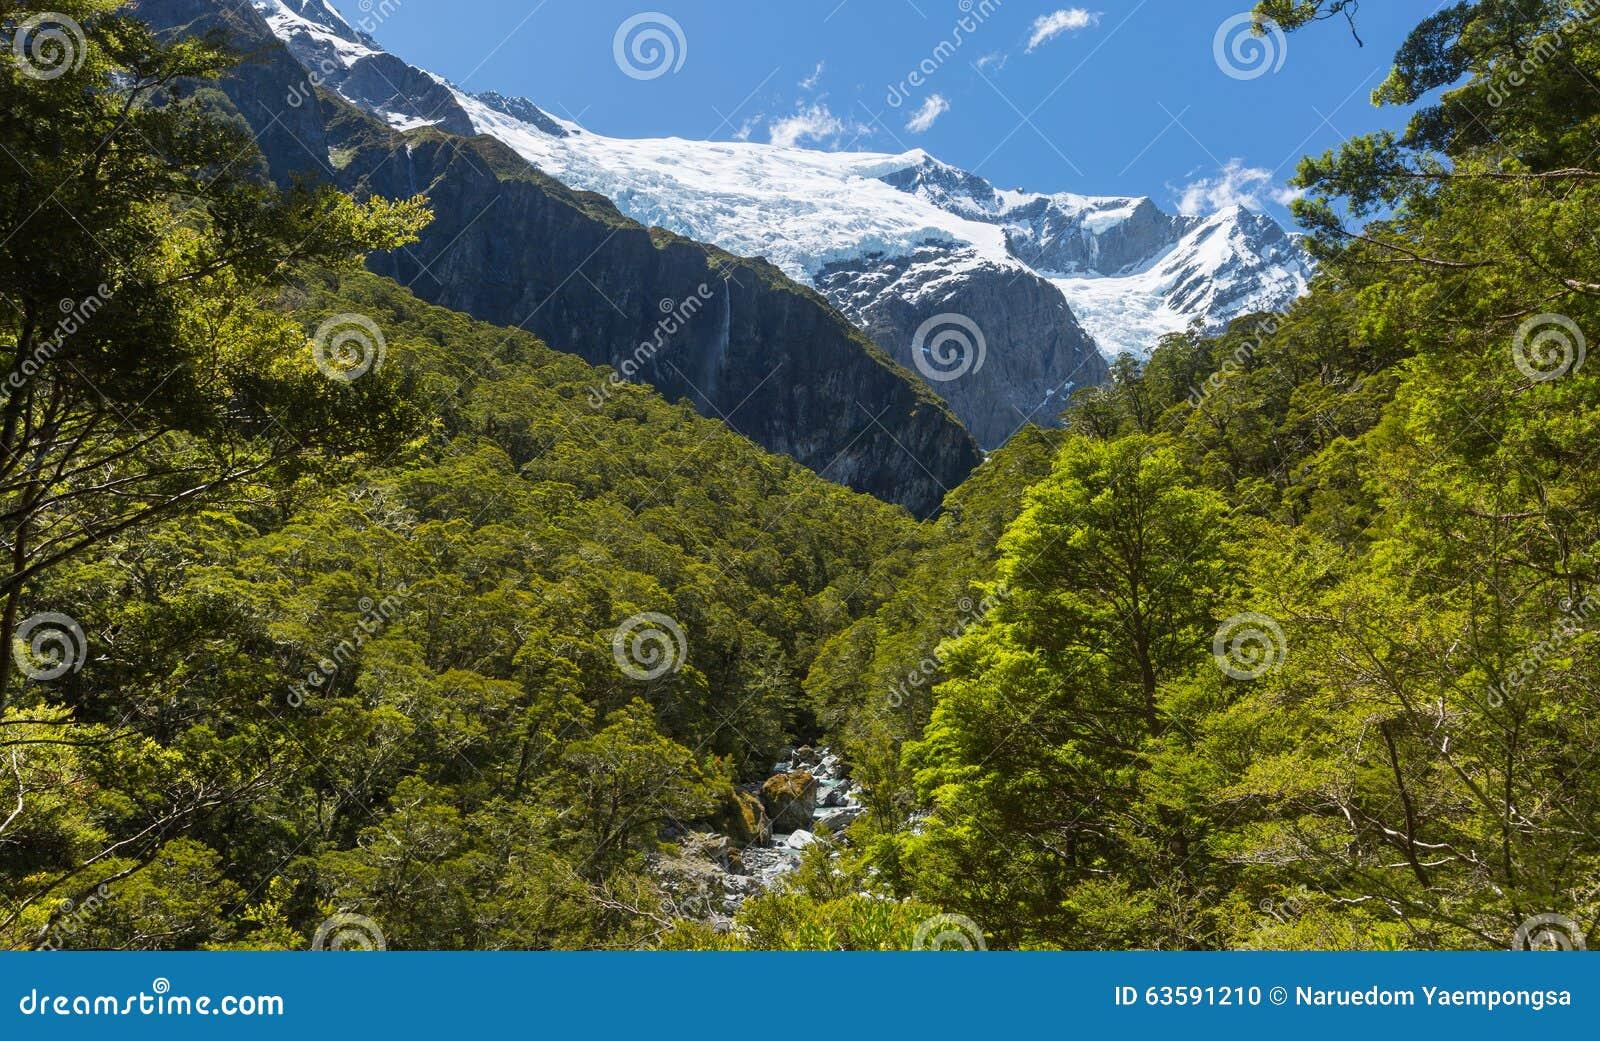 Majestic view of Rob Roy Glacier